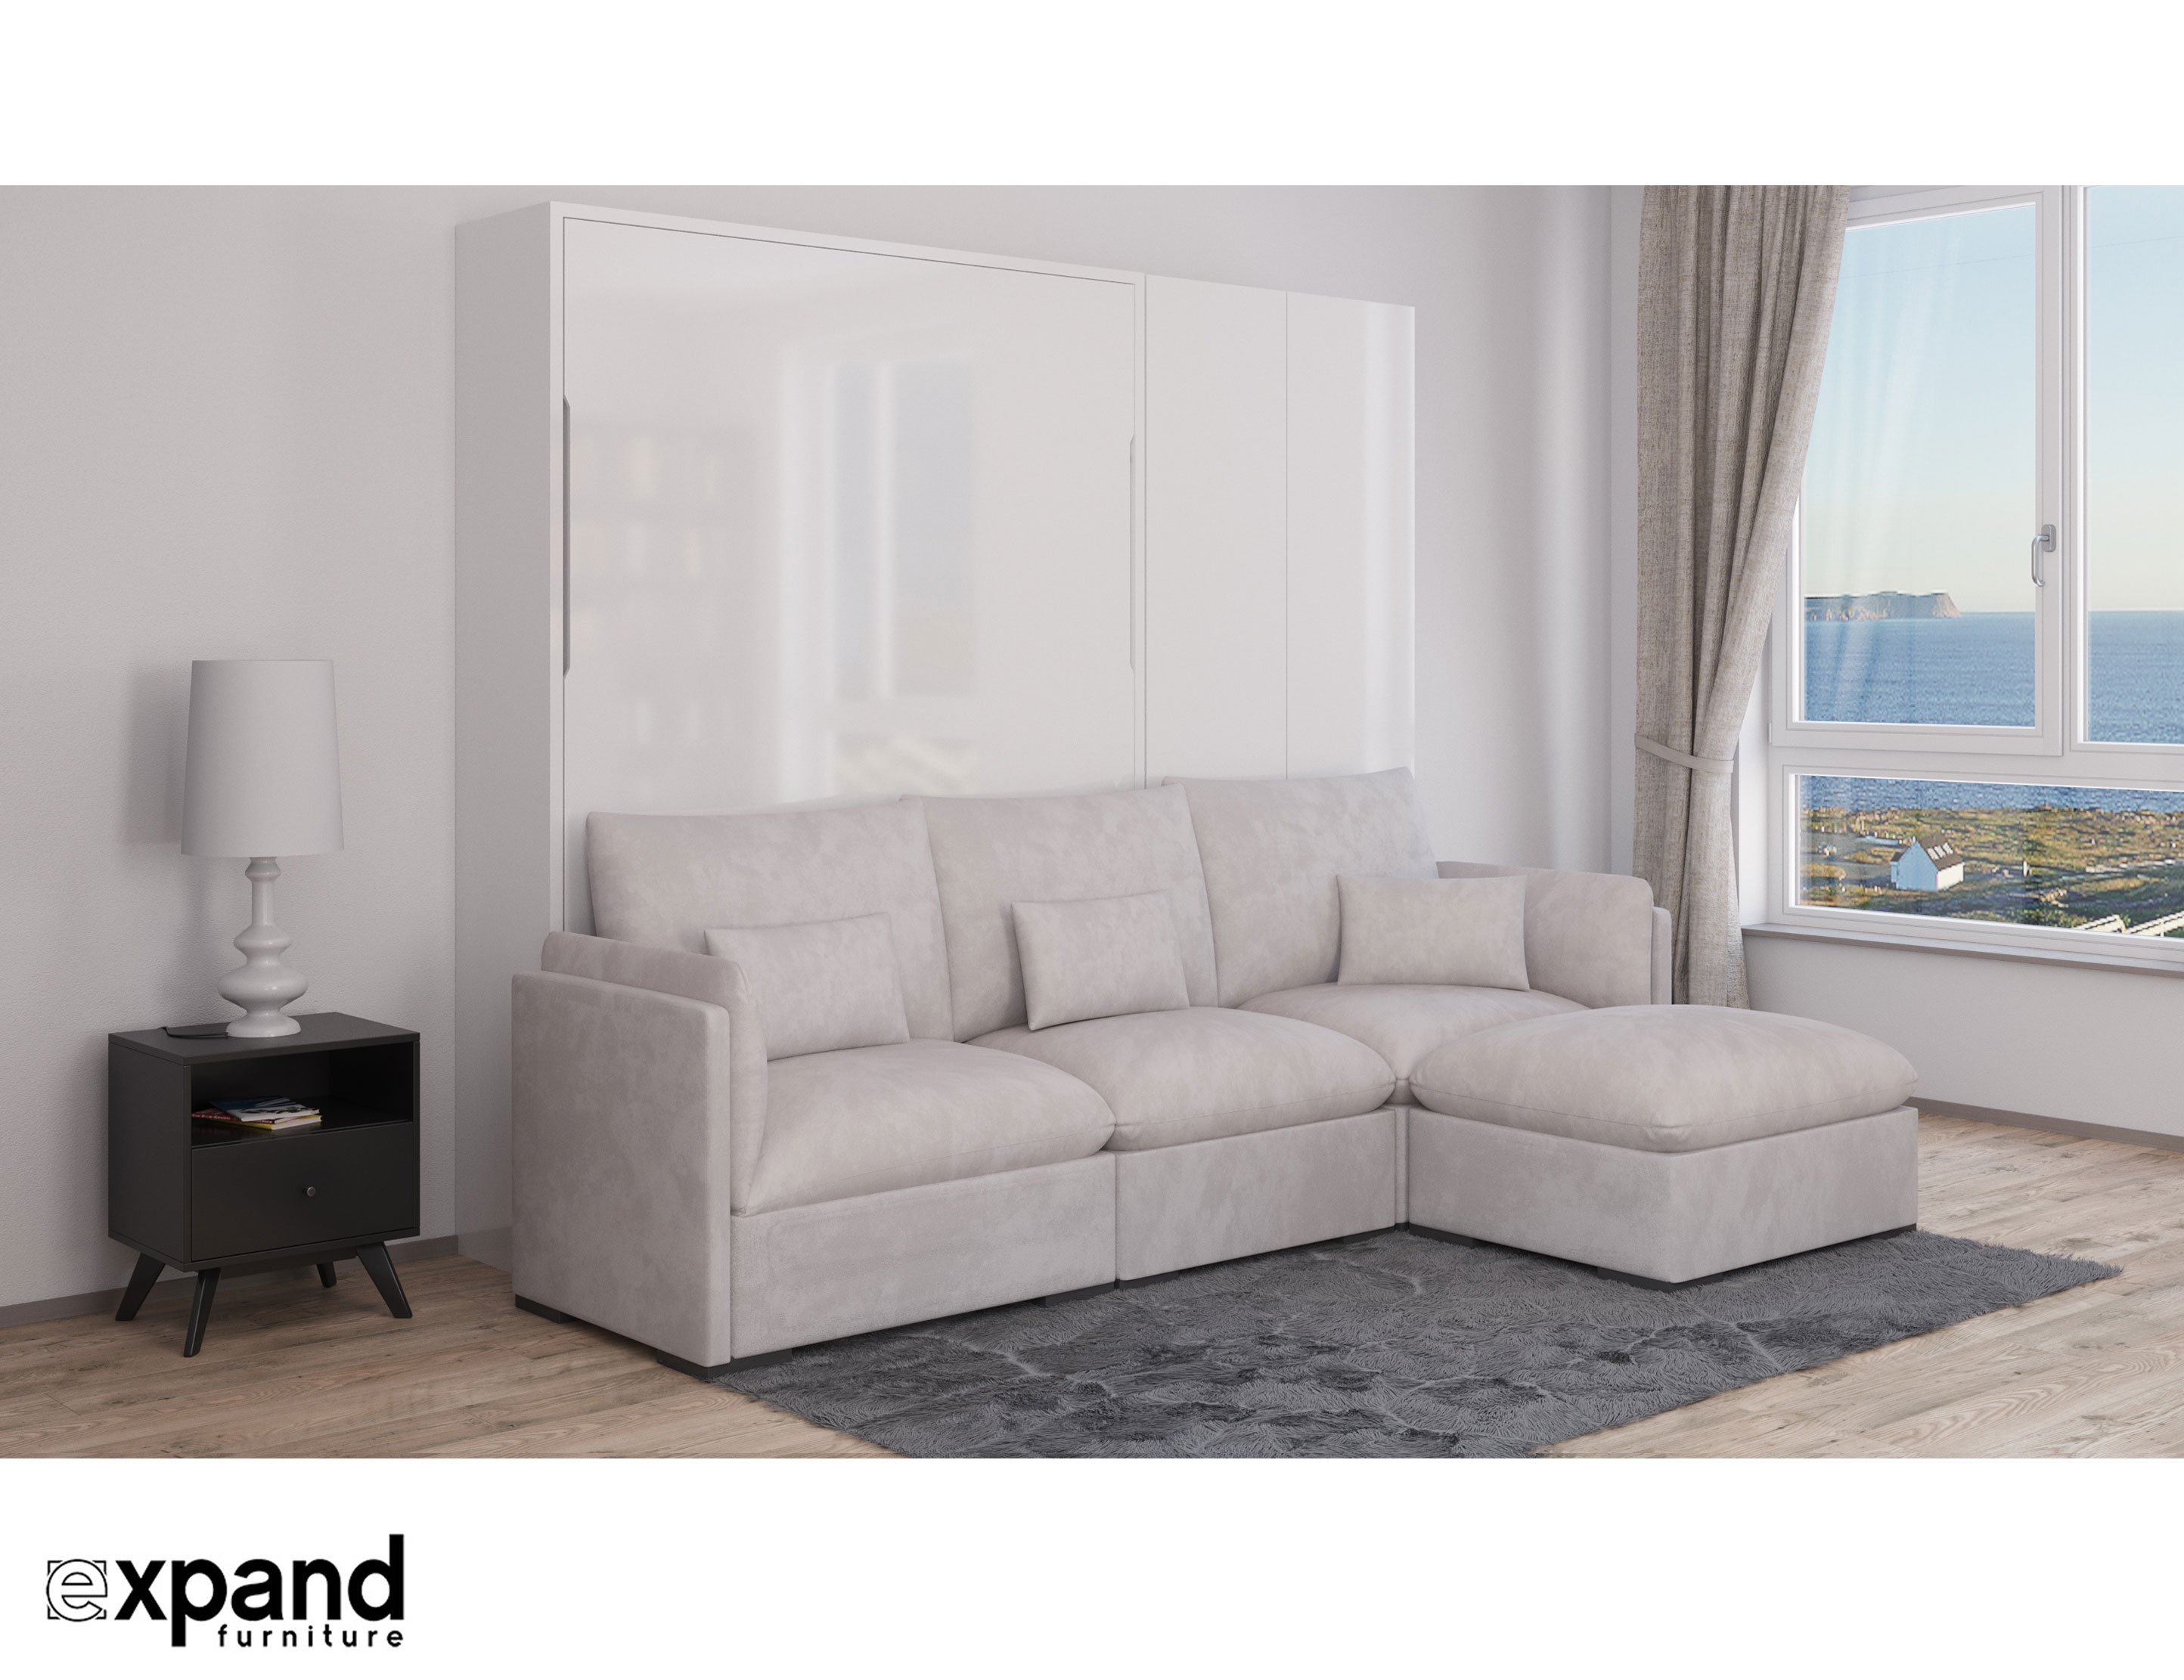 MurphySofa ADAGIO - Queen Luxury Sectional Sofa Wall Bed | Expand ...